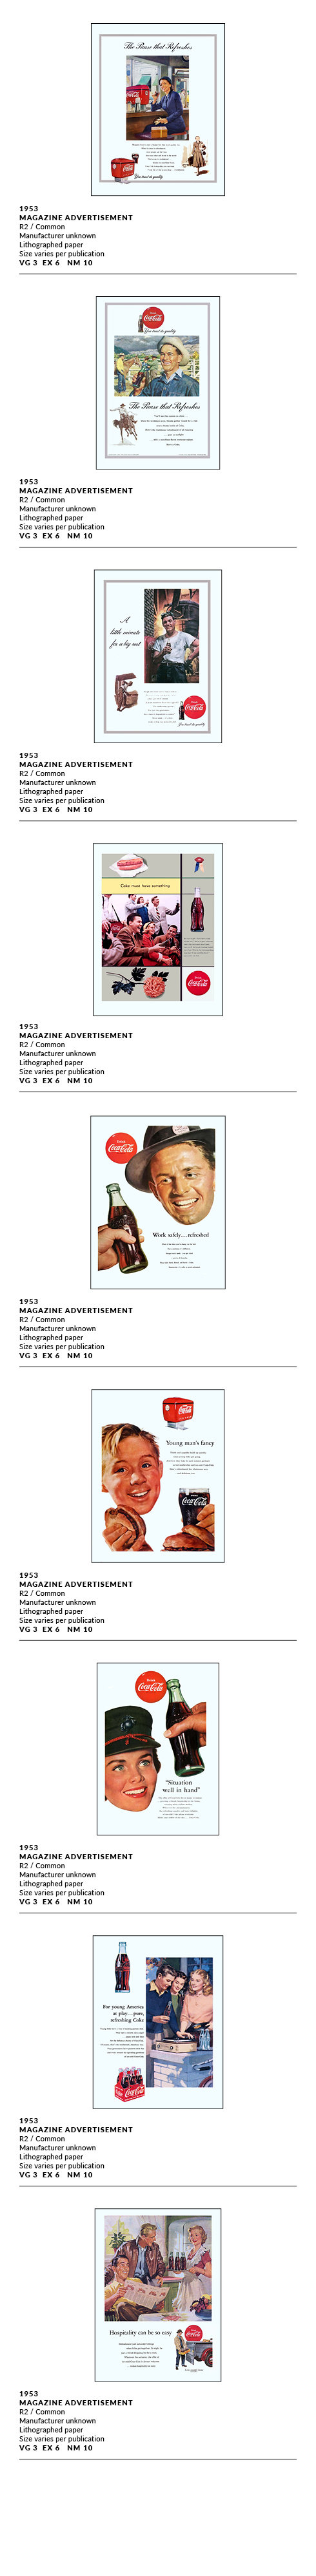 1950-54 Ads7.jpg